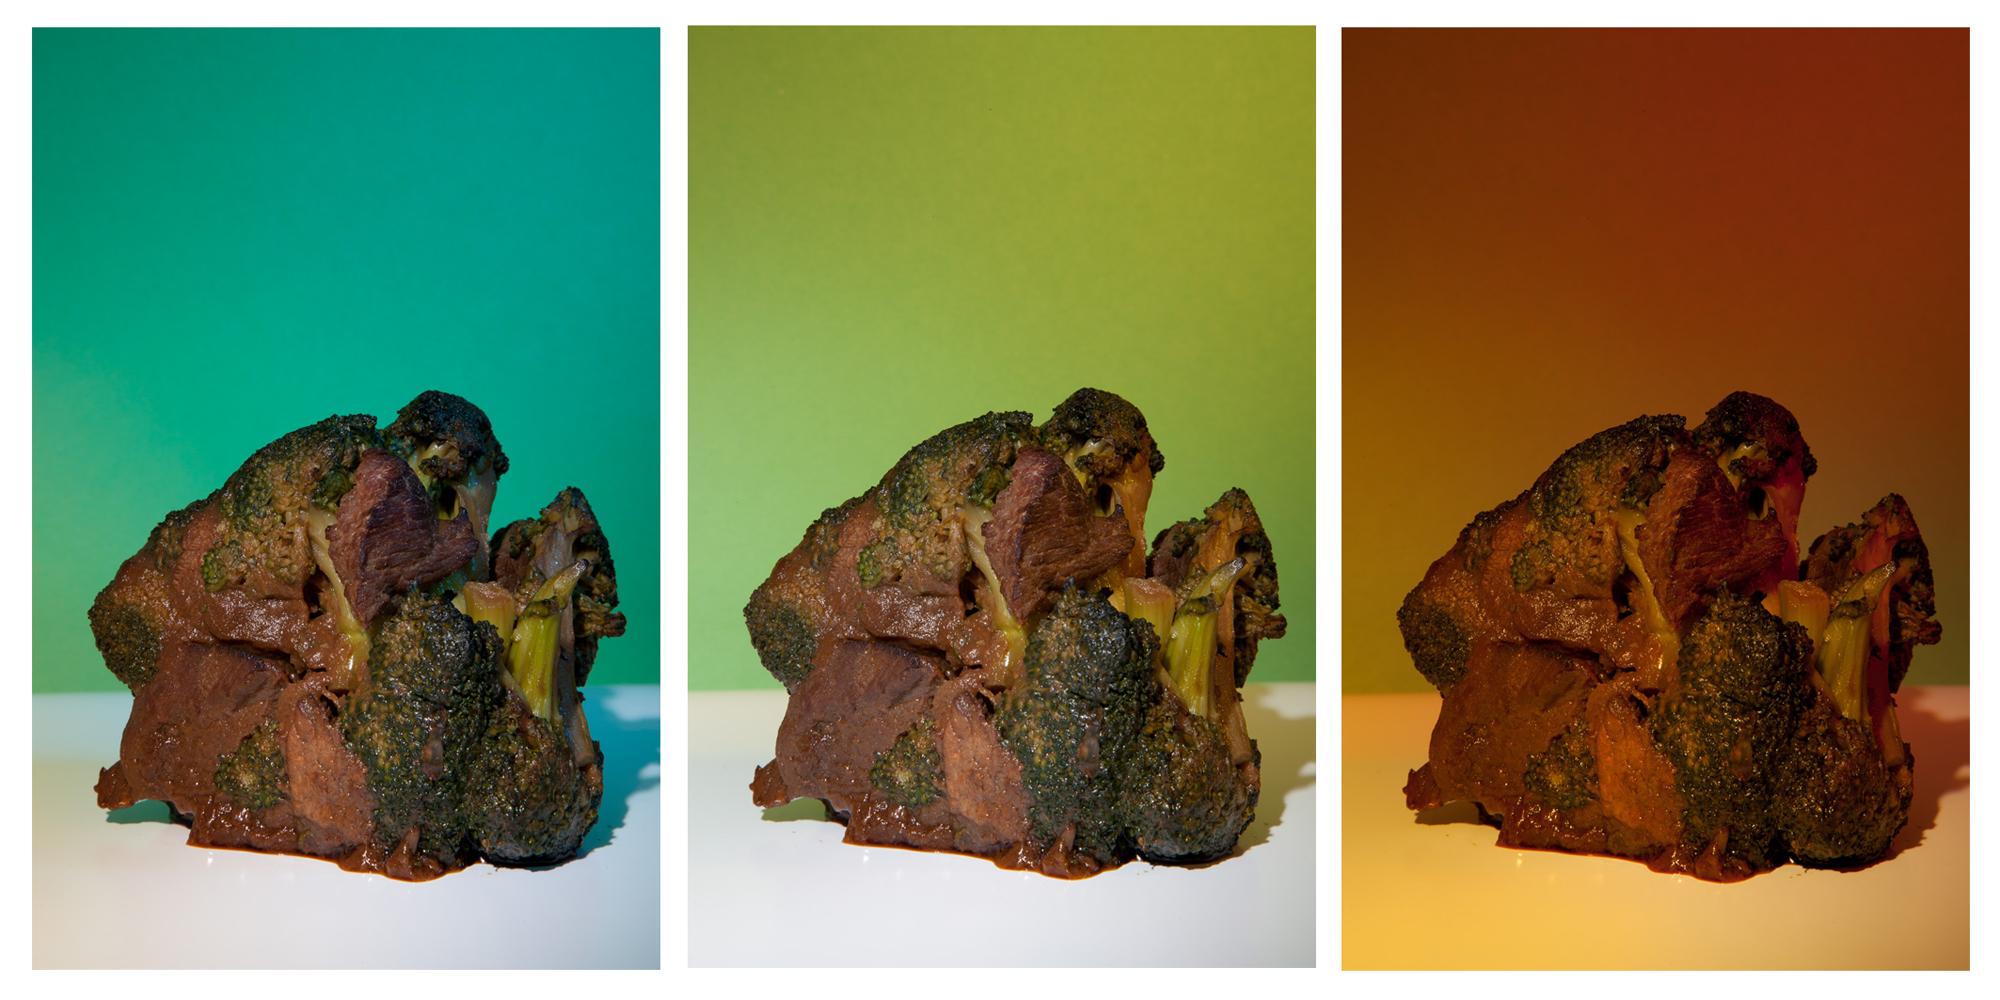 "Beef and Broccoli #5-1, #5-2, #5-3, 10""x16"" each, Archival Inkjet Print, 2011.  芥蘭牛五號之一、五號之二、五號之三,25x40公分,無酸微噴藝術紙,2011。"